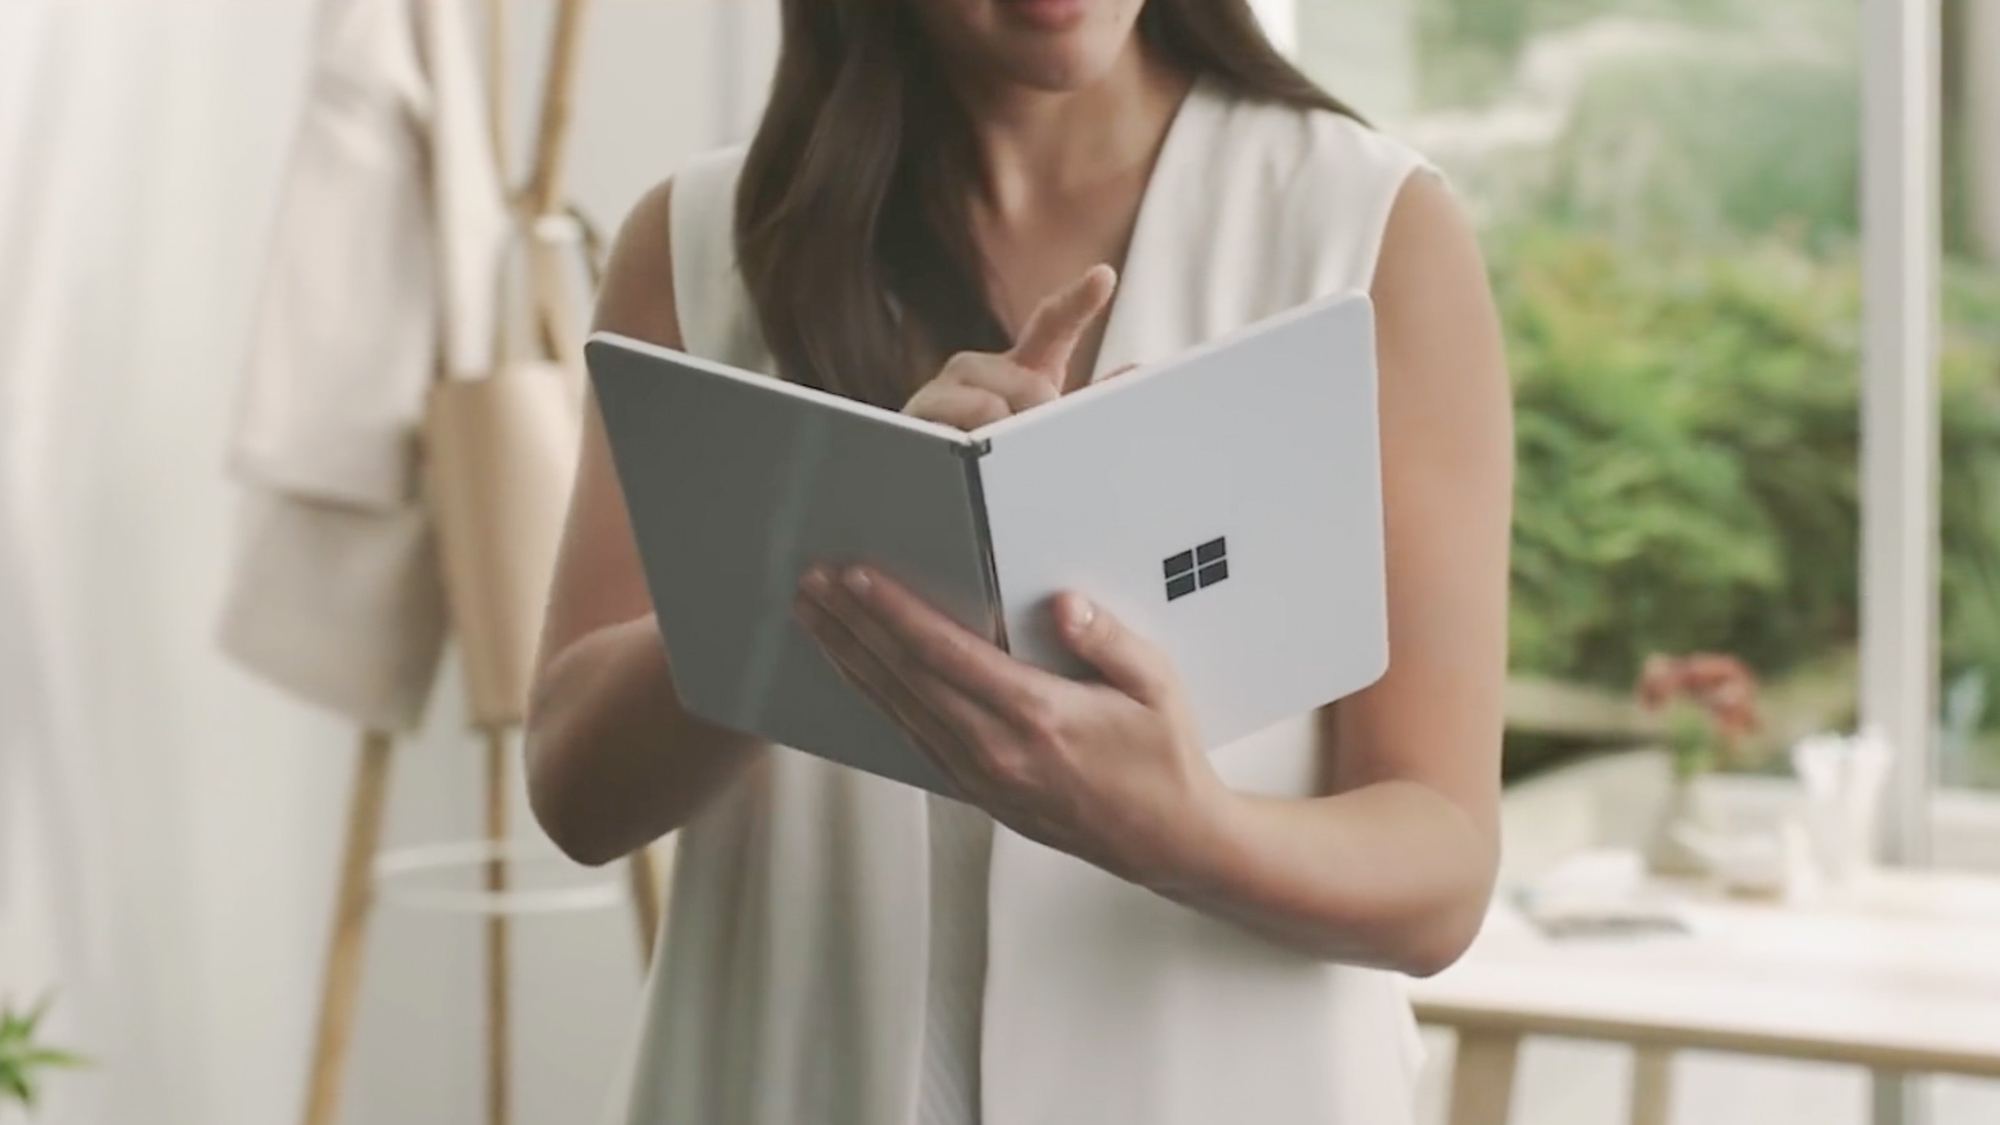 Surface Neo,微软眼中的未来电脑